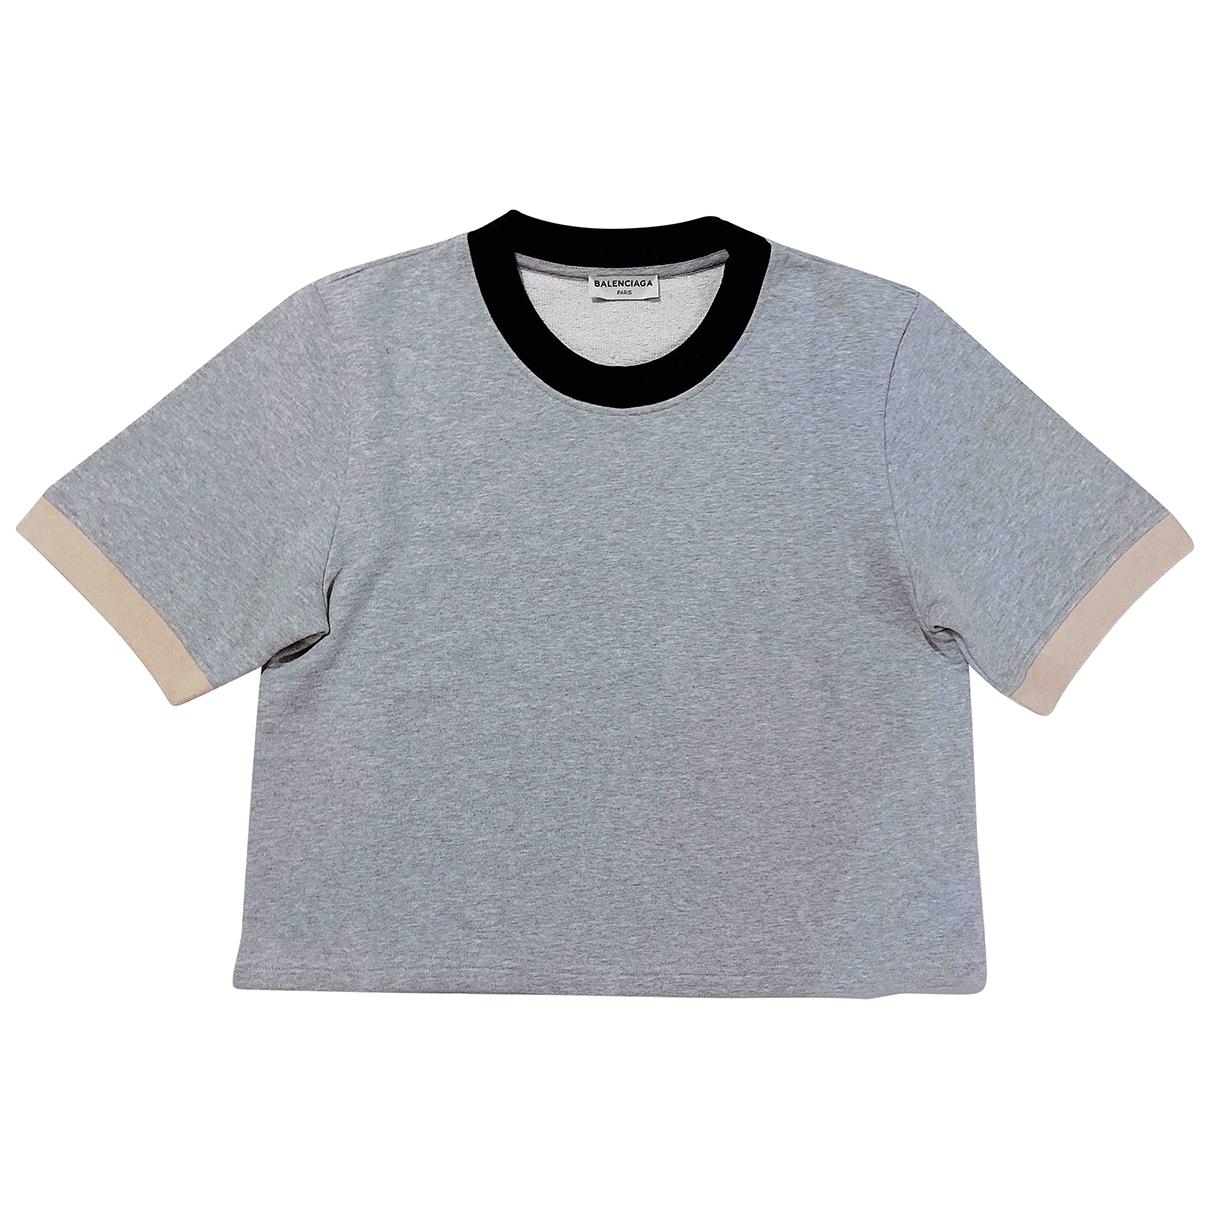 Balenciaga \N Grey Cotton  top for Women L International